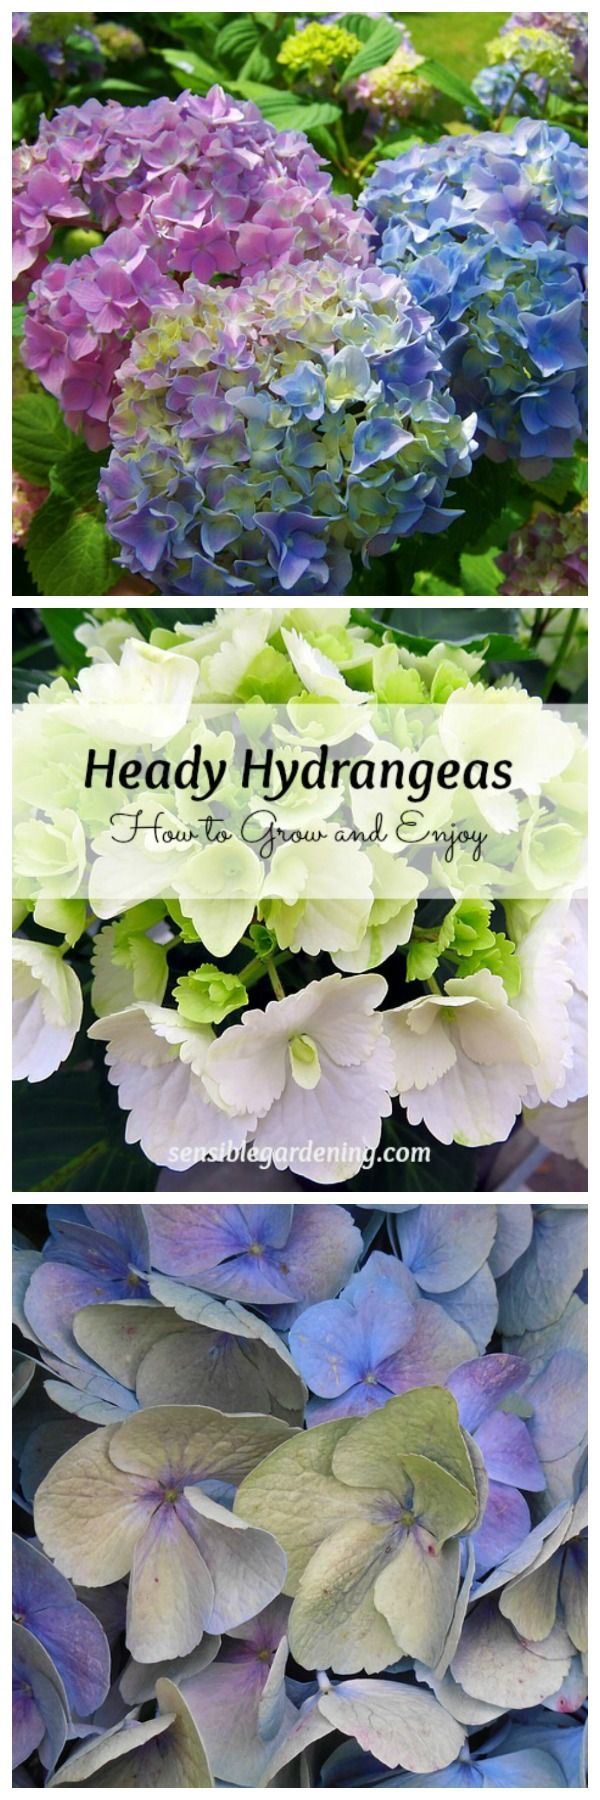 Heady Hydrangeas with Sensible Gardening